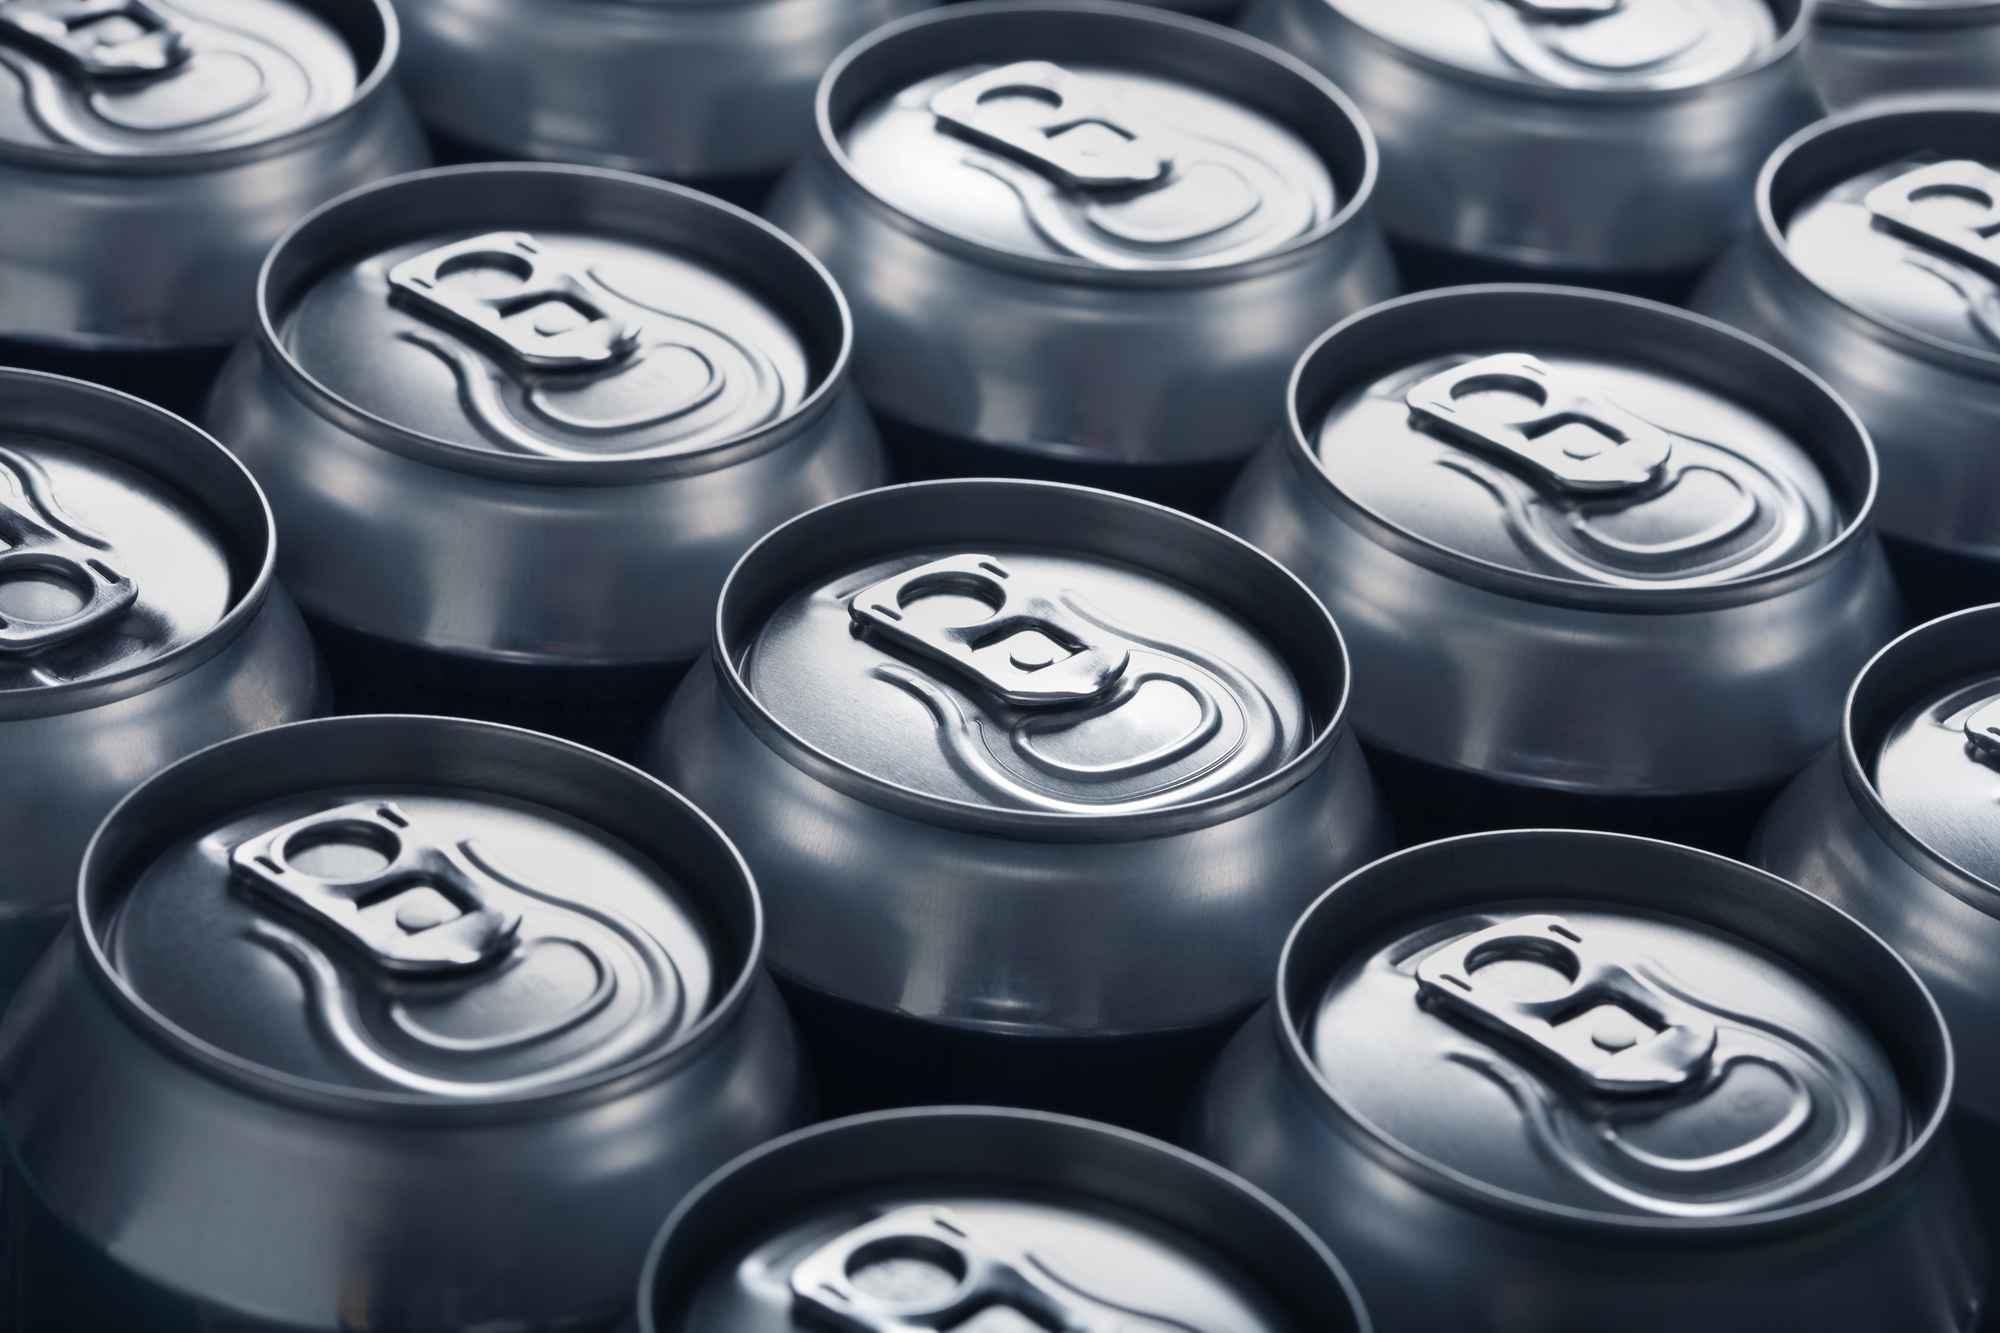 Scrap Metal in Marietta GA | ABC Recycling has scrap metal ...